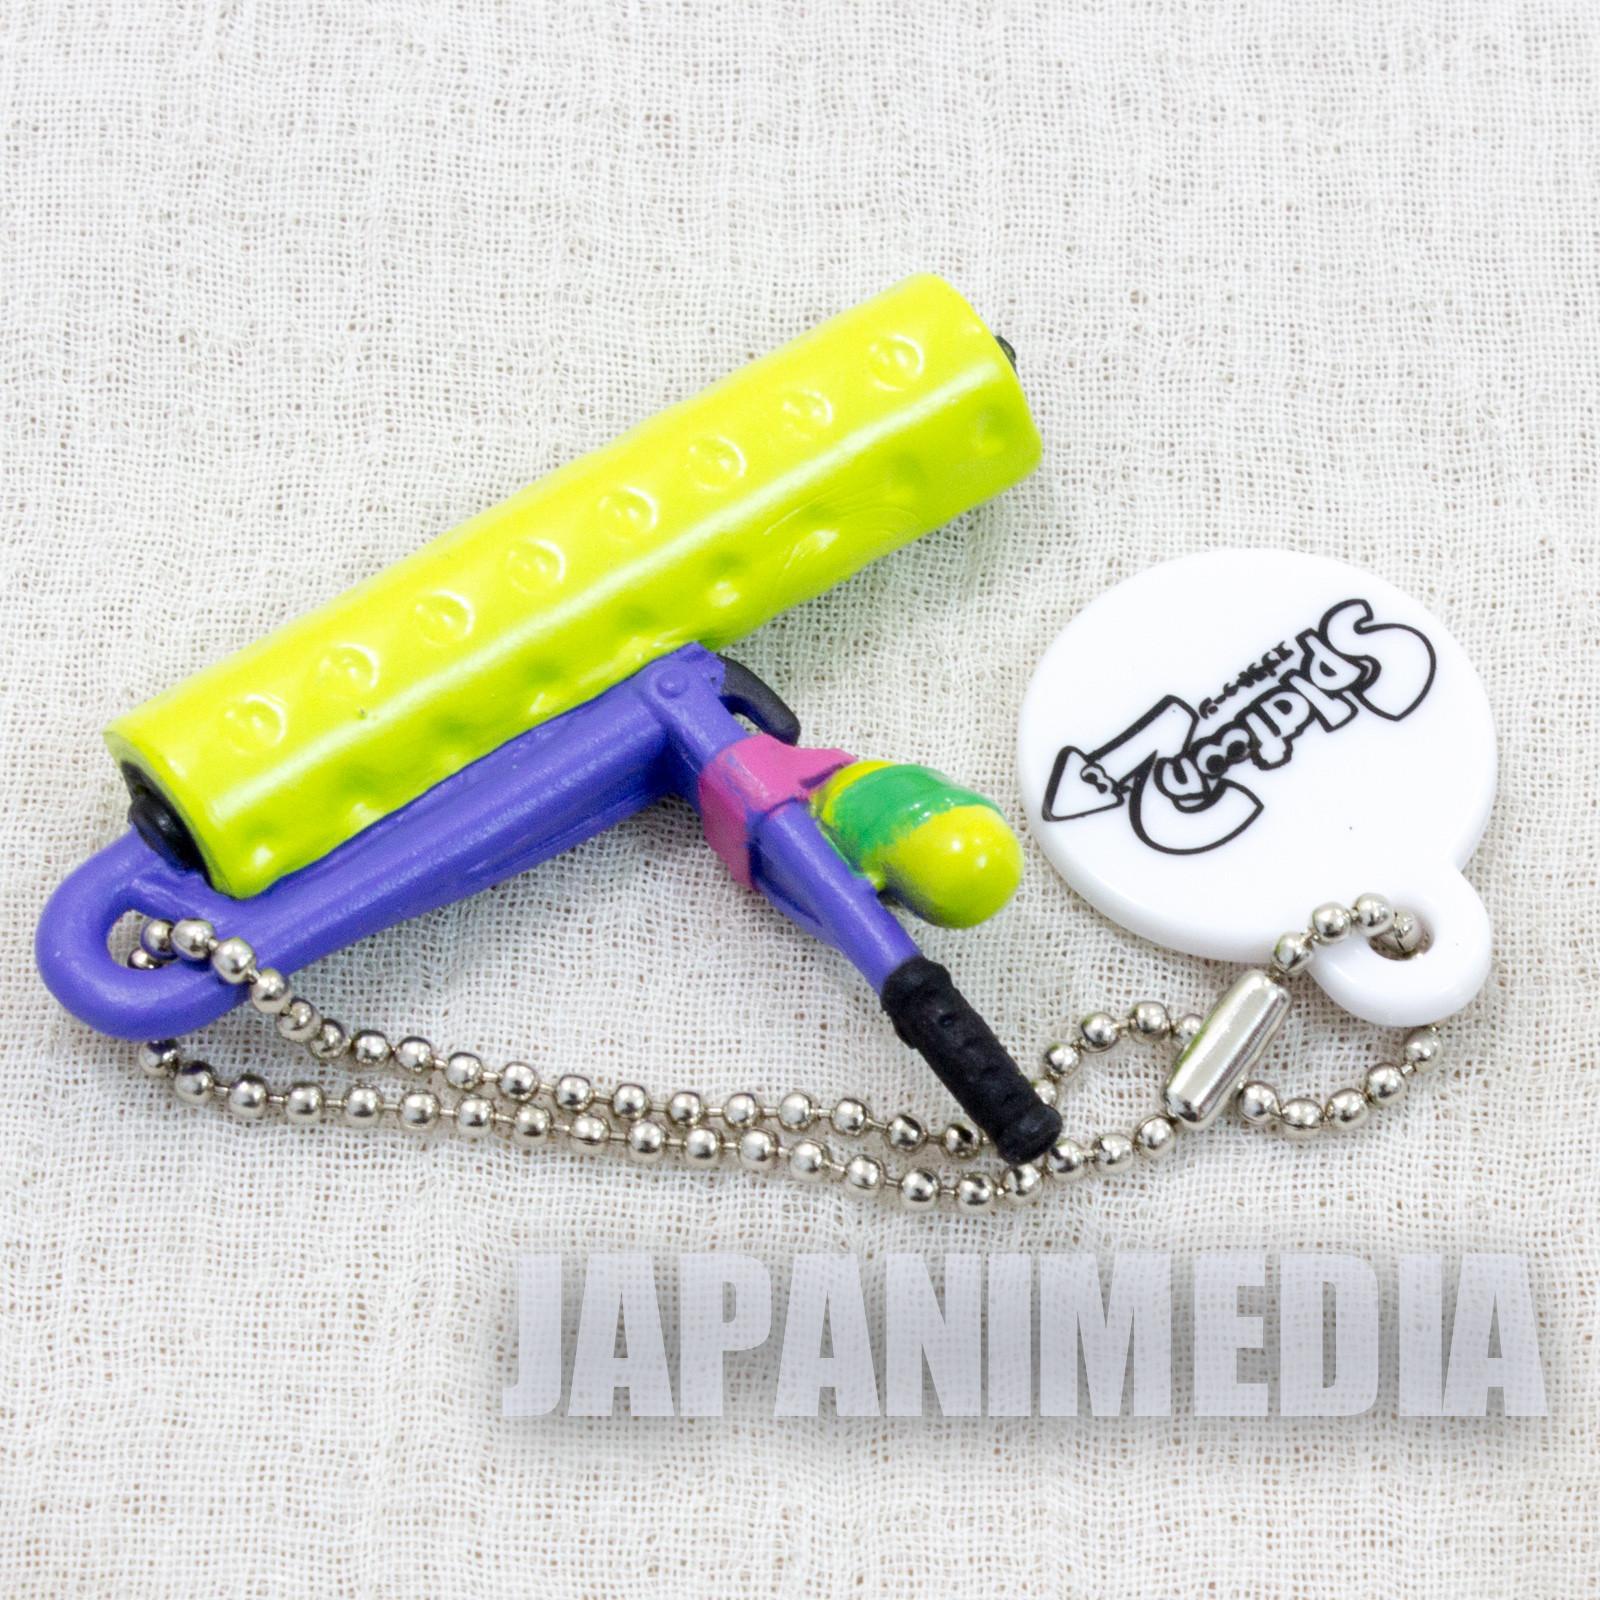 Splatoon 2 Weapon Figure Ballchain Splat Roller #1 Takara Tomy Nintendo Switch